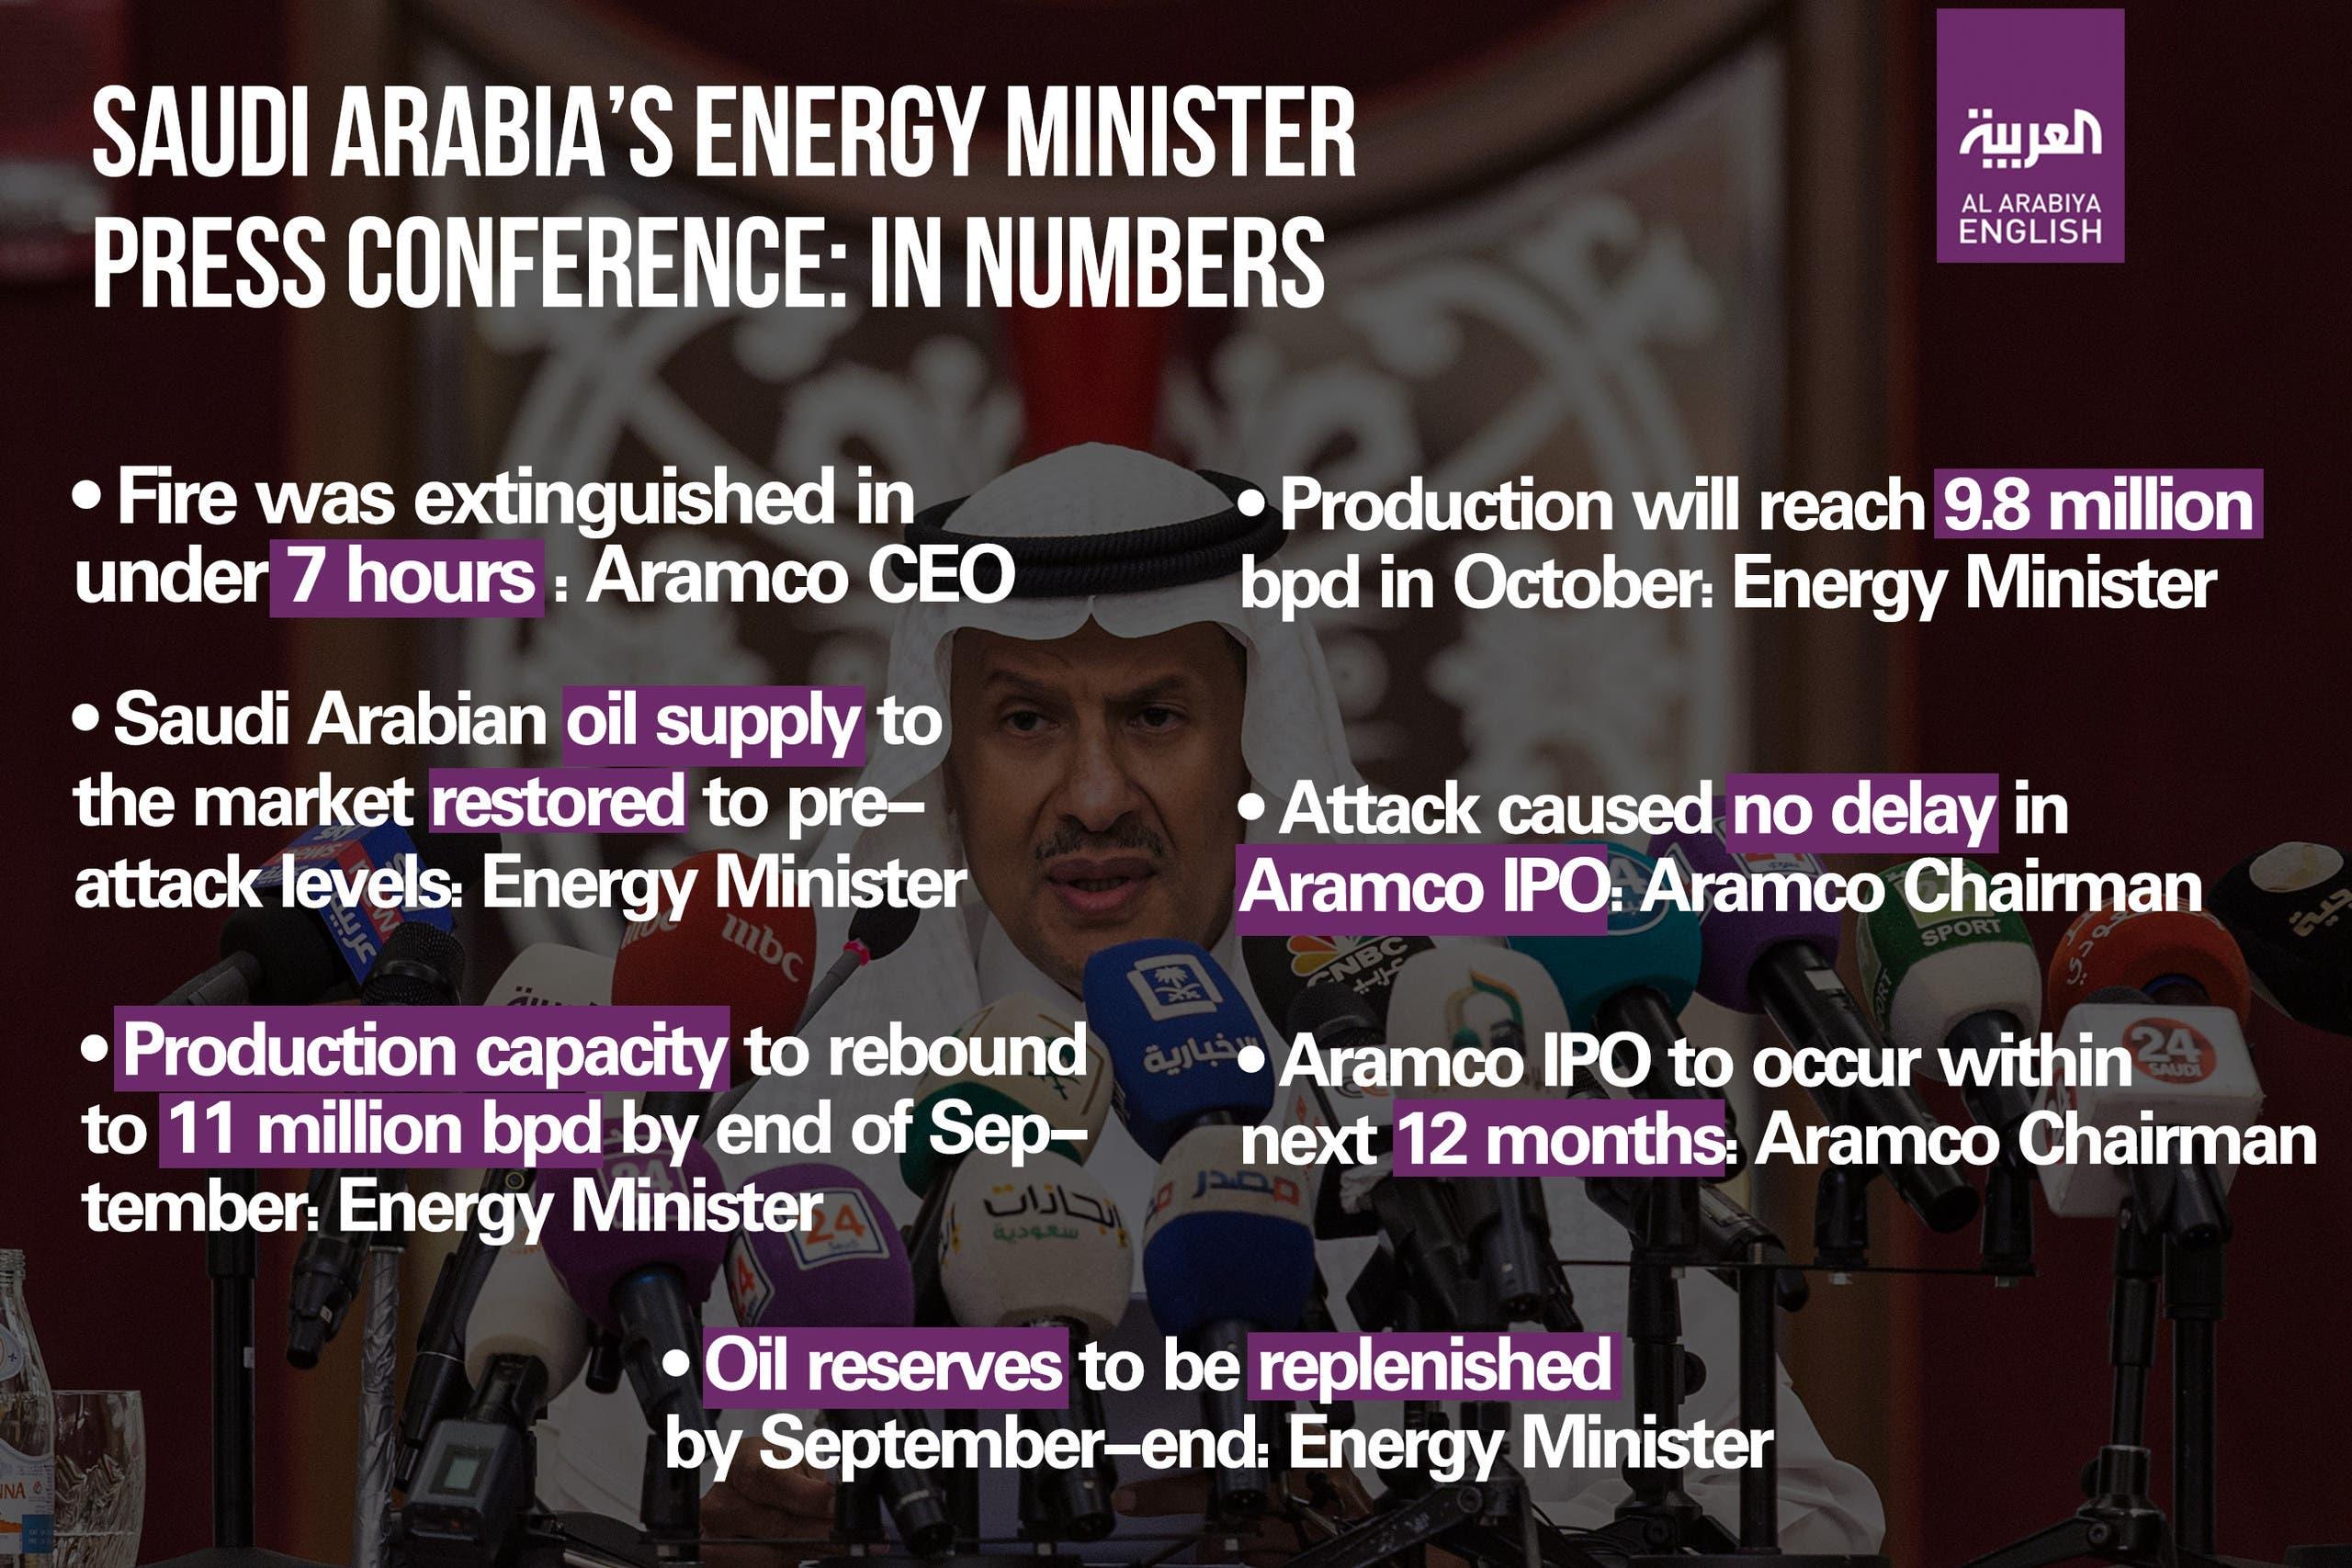 saudi energy minister presser infographic